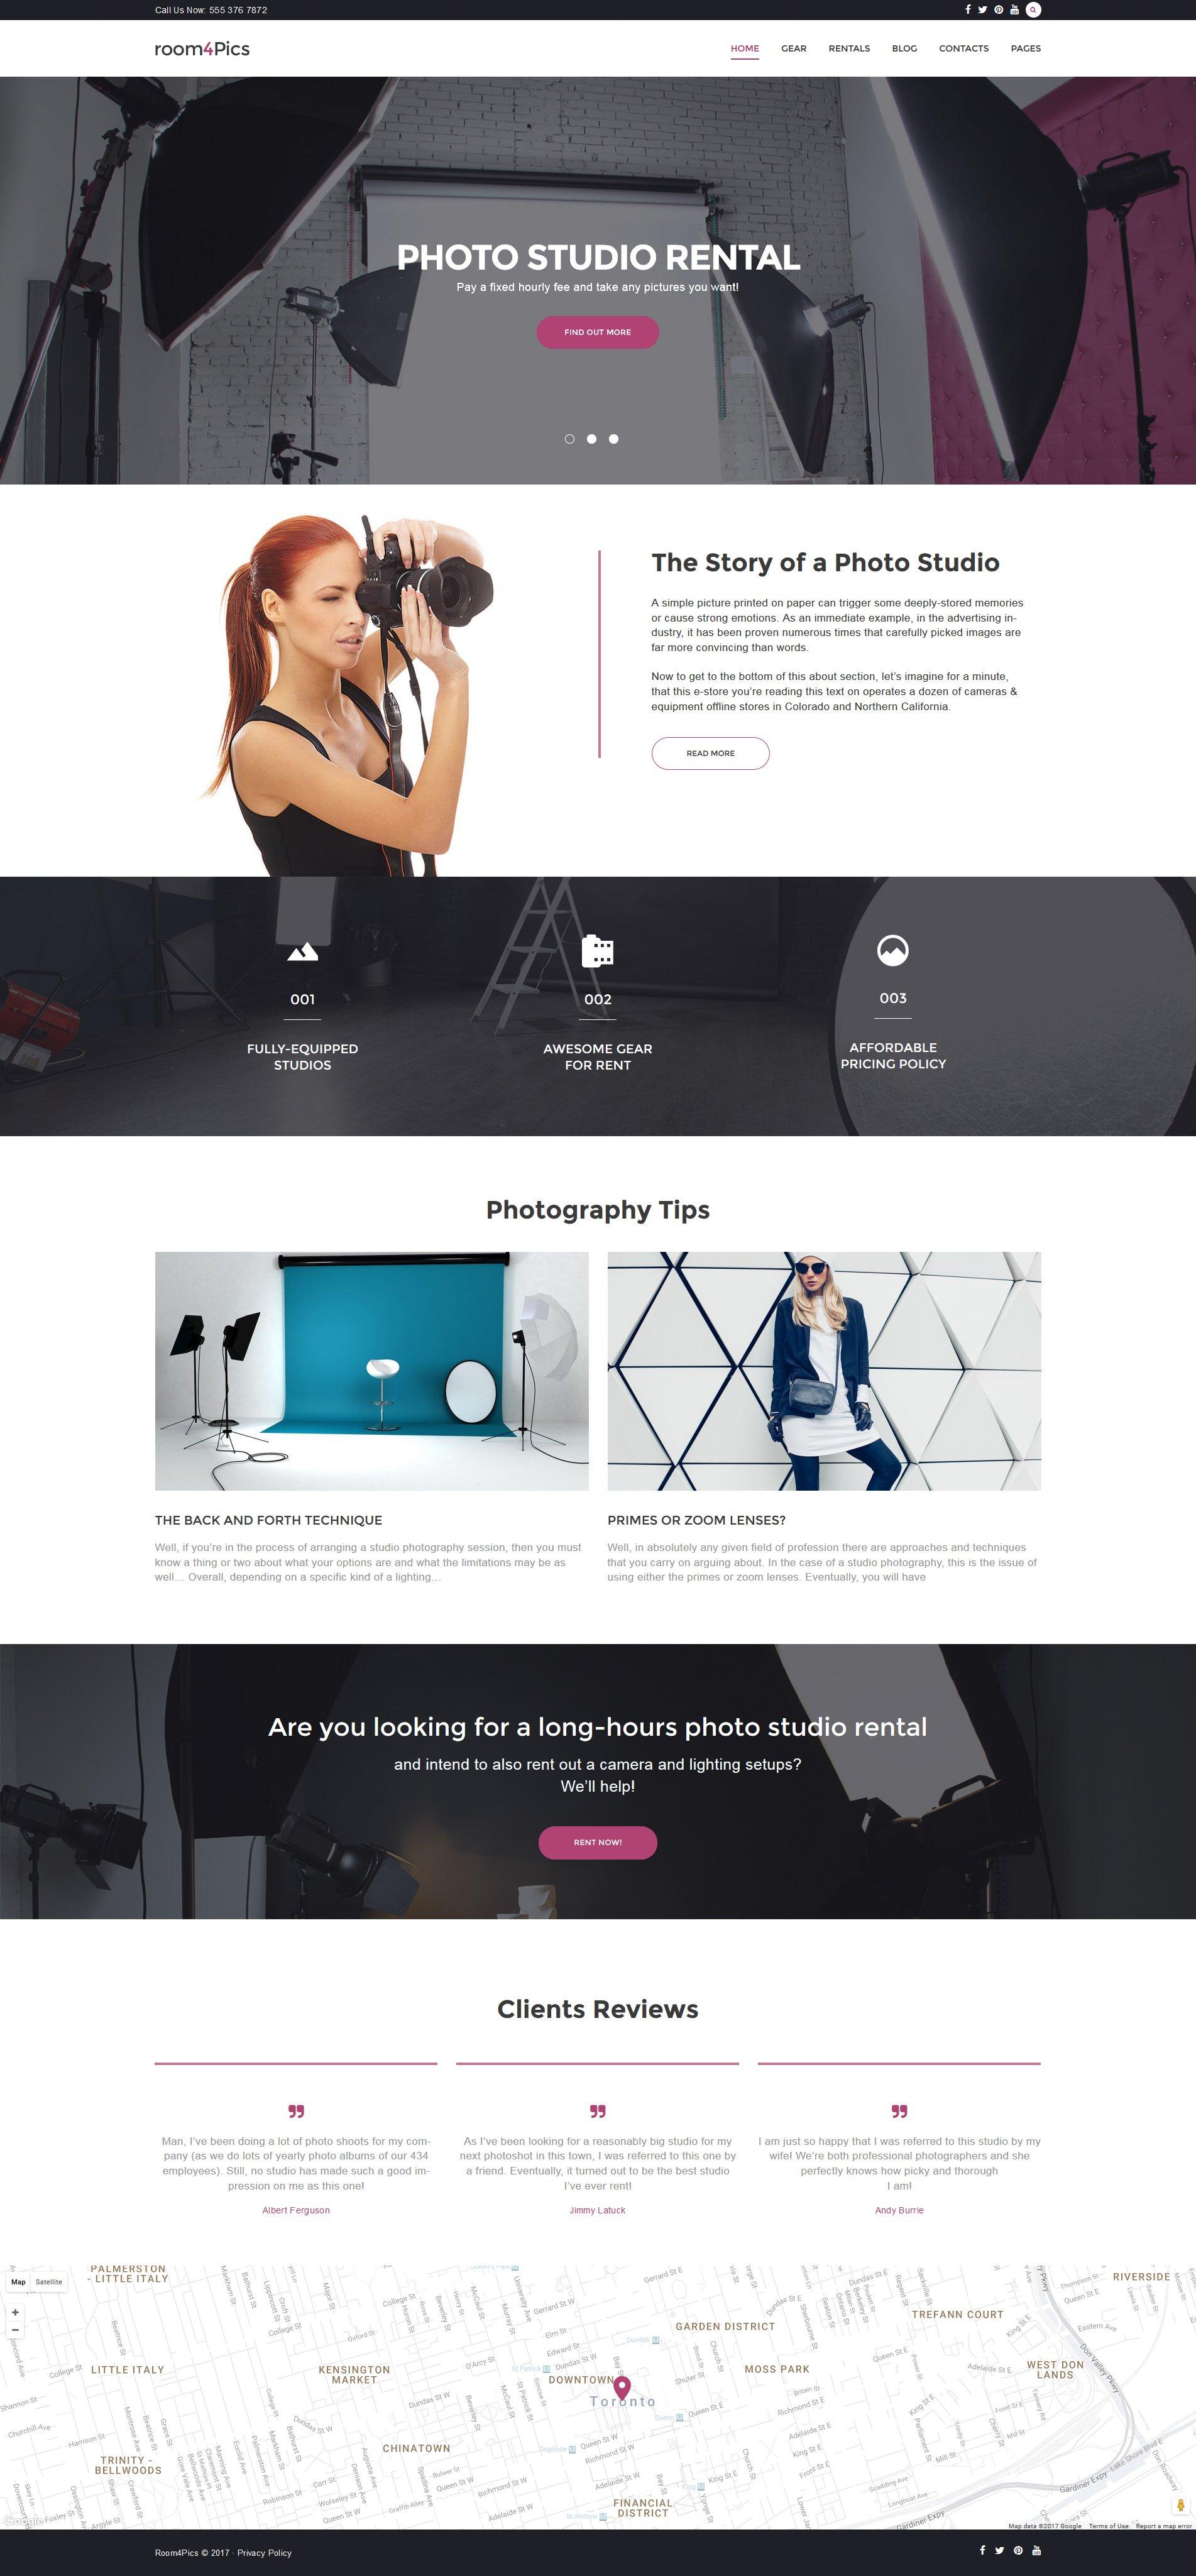 """Room4Pics - Photo Studio Rental"" - адаптивний WordPress шаблон №59025 - скріншот"